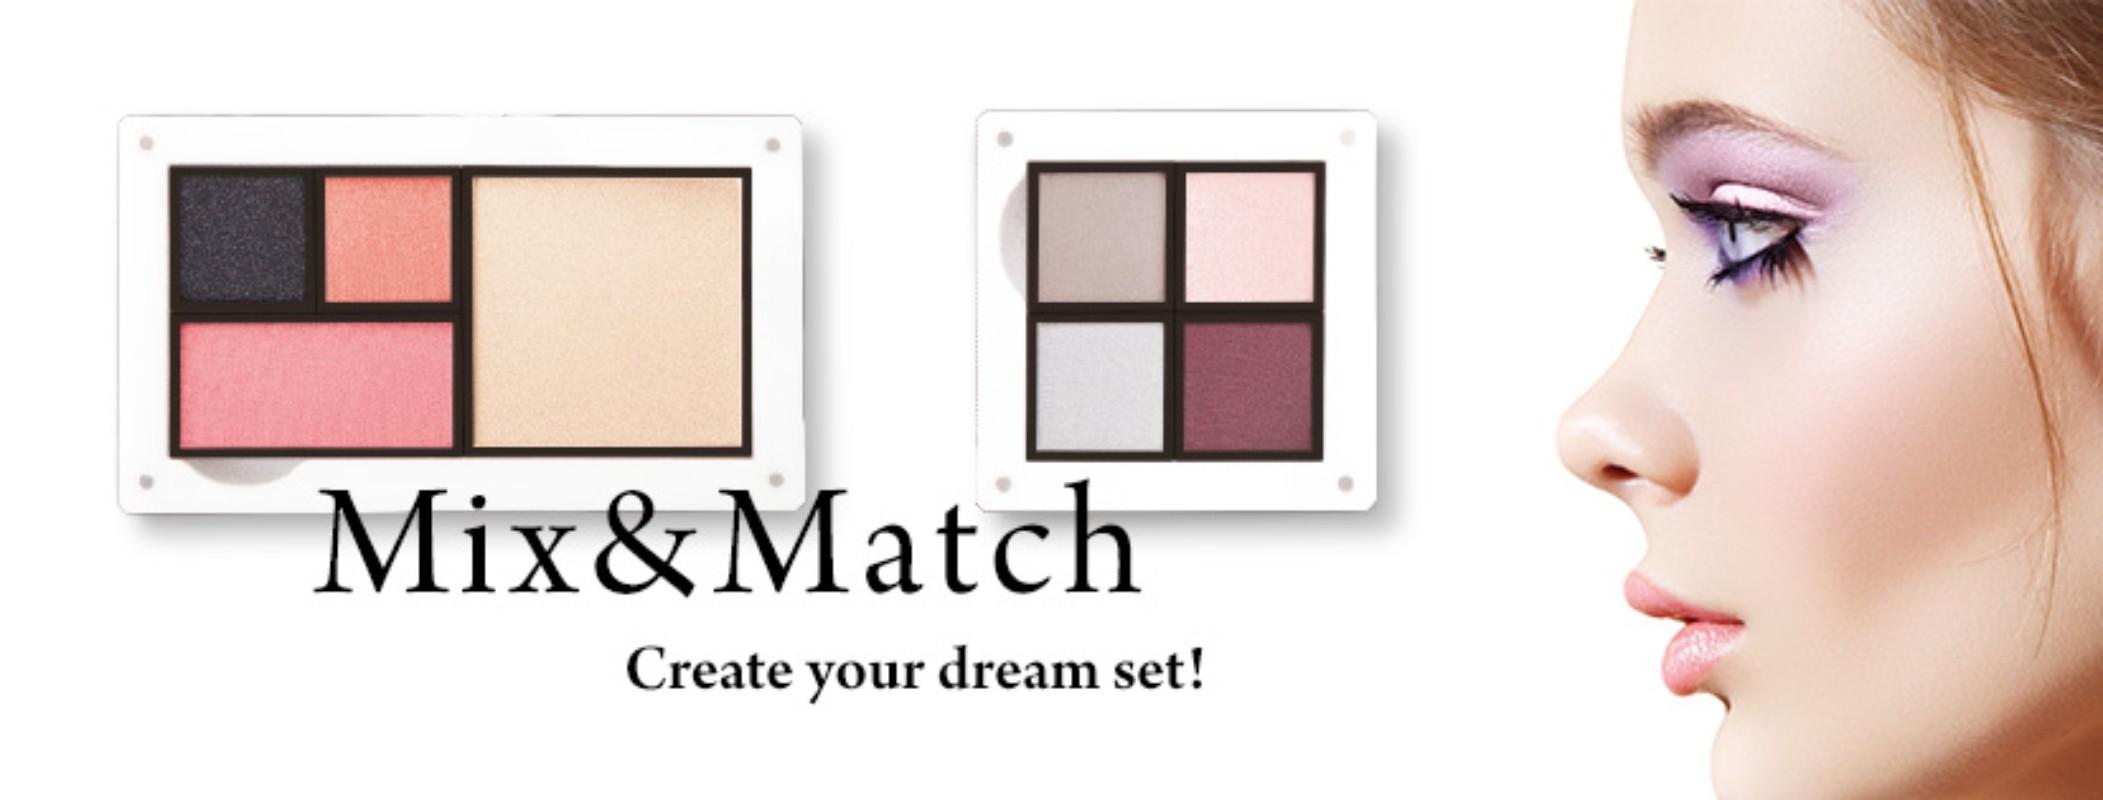 fm world mix and match make up palettes